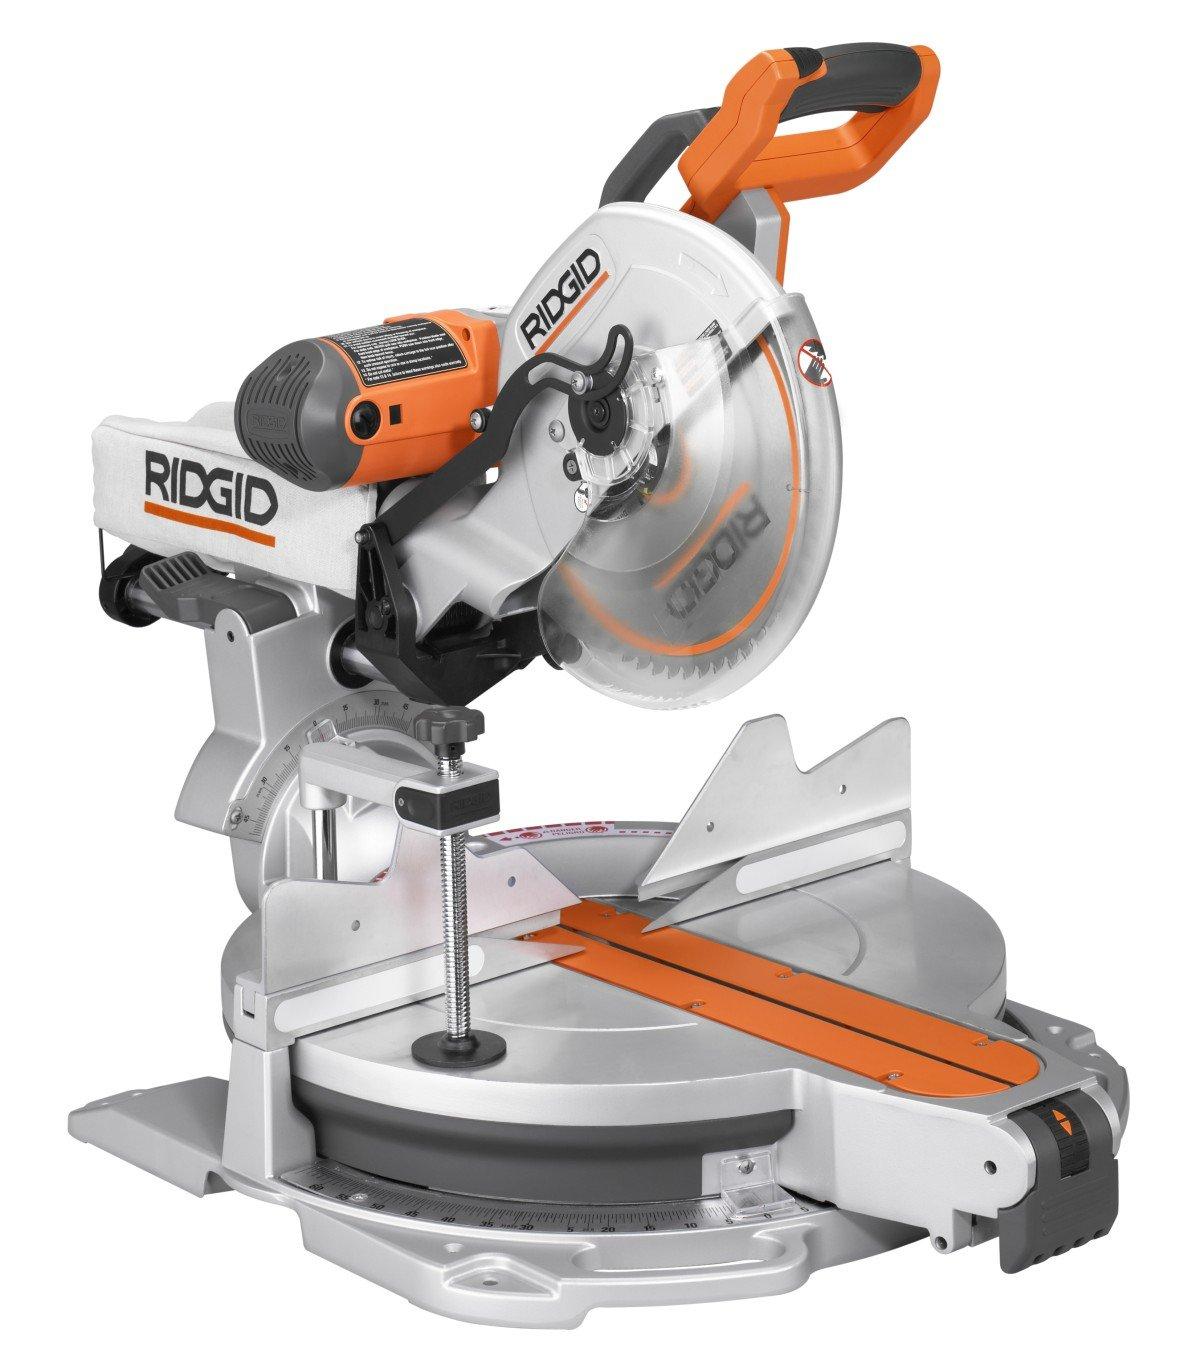 ridgid miter saw table. ridgid ms1290lza saw, 12-inch compound sliding miter with laser - power saws amazon.com saw table